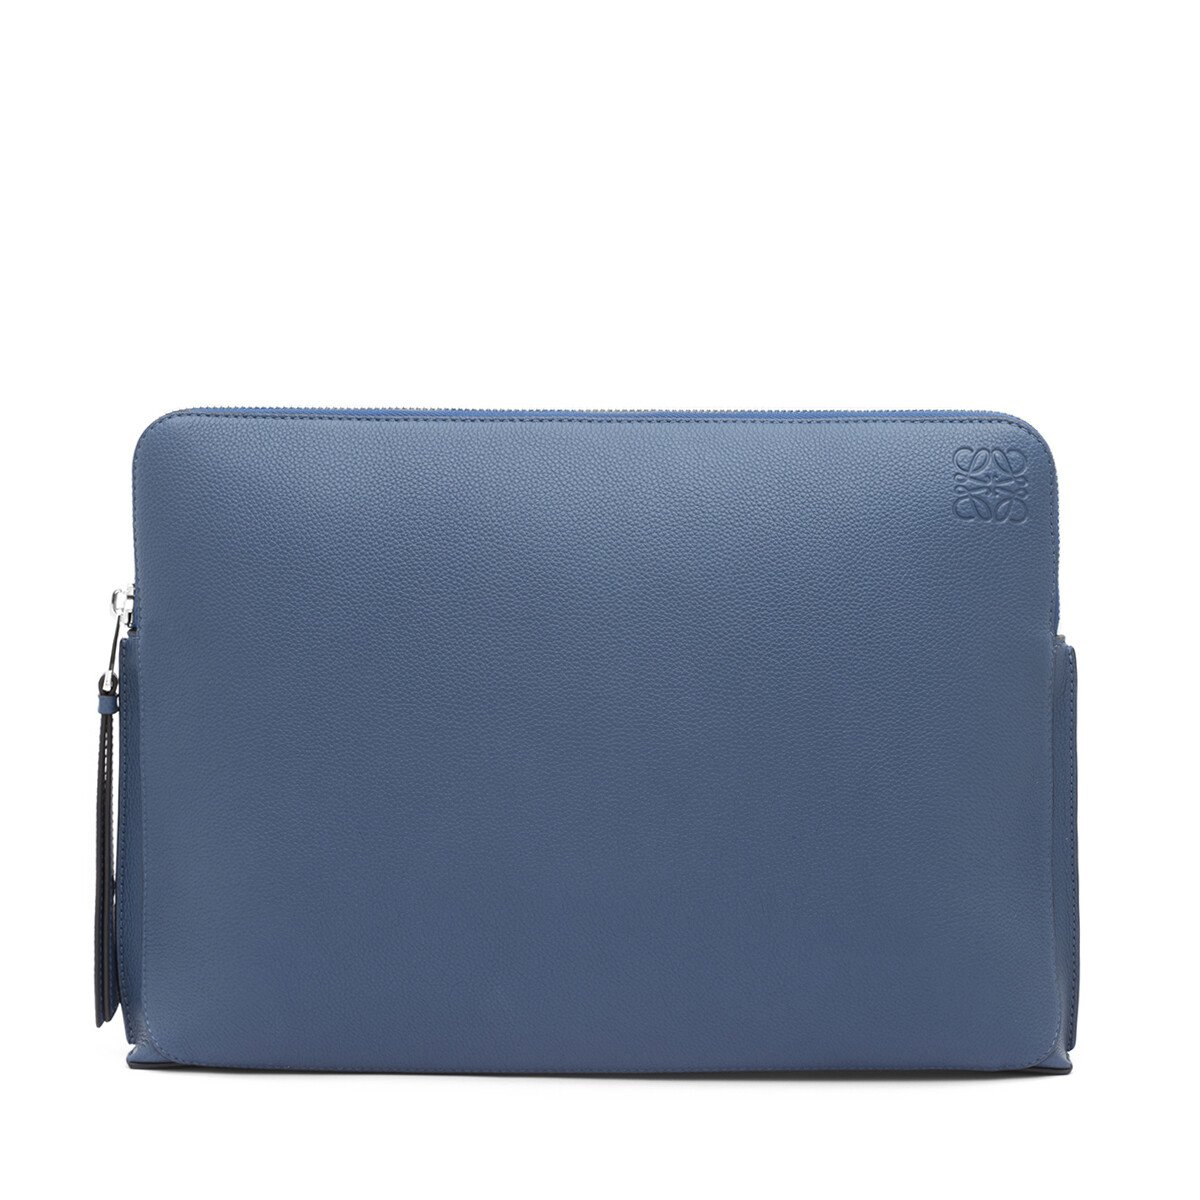 LOEWE Goya Portfolio 靛蓝色 front